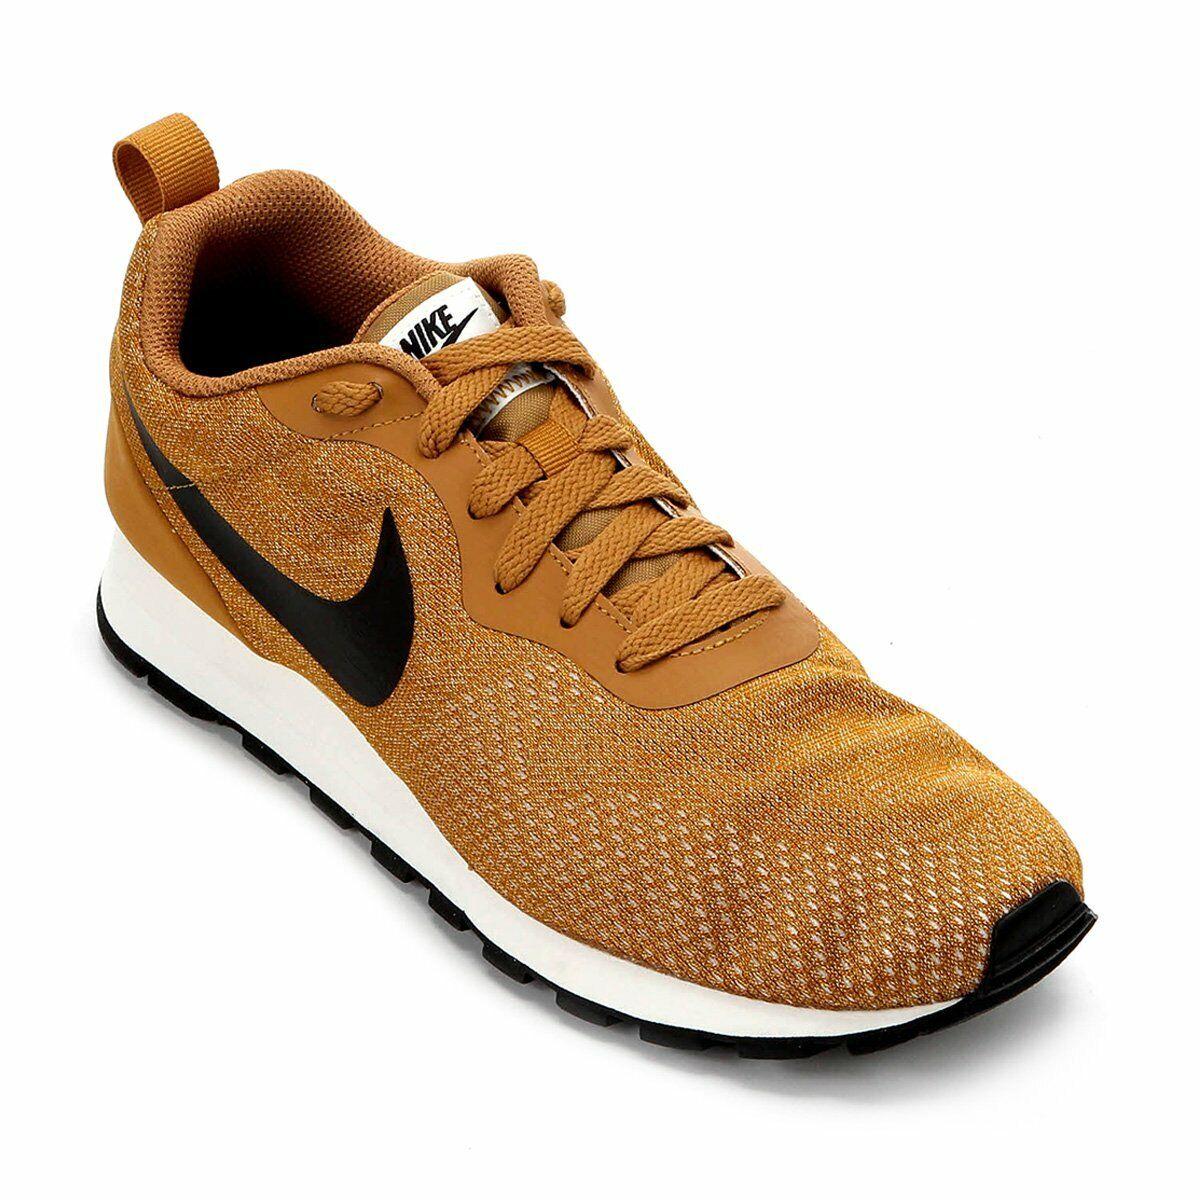 dividir Completo cielo  Nike Men's MD Runner 2 Mid Prem Running Shoe 7.5 for sale online | eBay